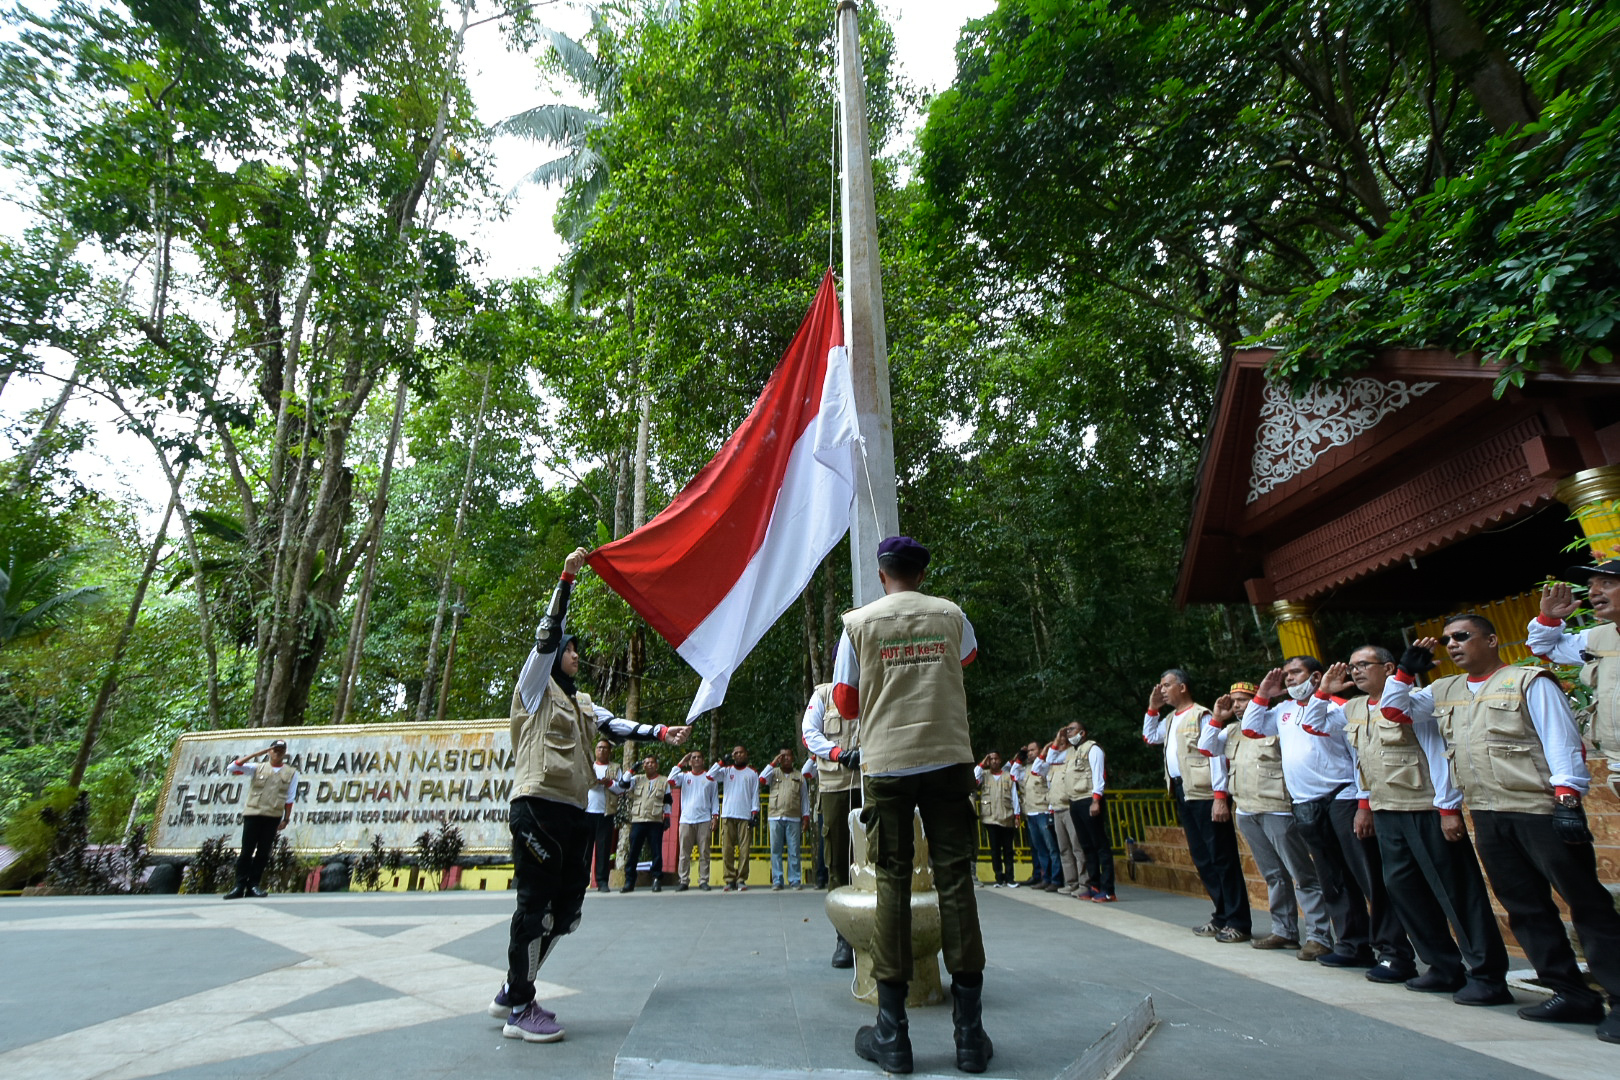 http://news.unimal.ac.id/index/single/1460/tim-touring-merdeka-unimal-upacara-bendera-dan-samadiyah-di-makam-teuku-umar